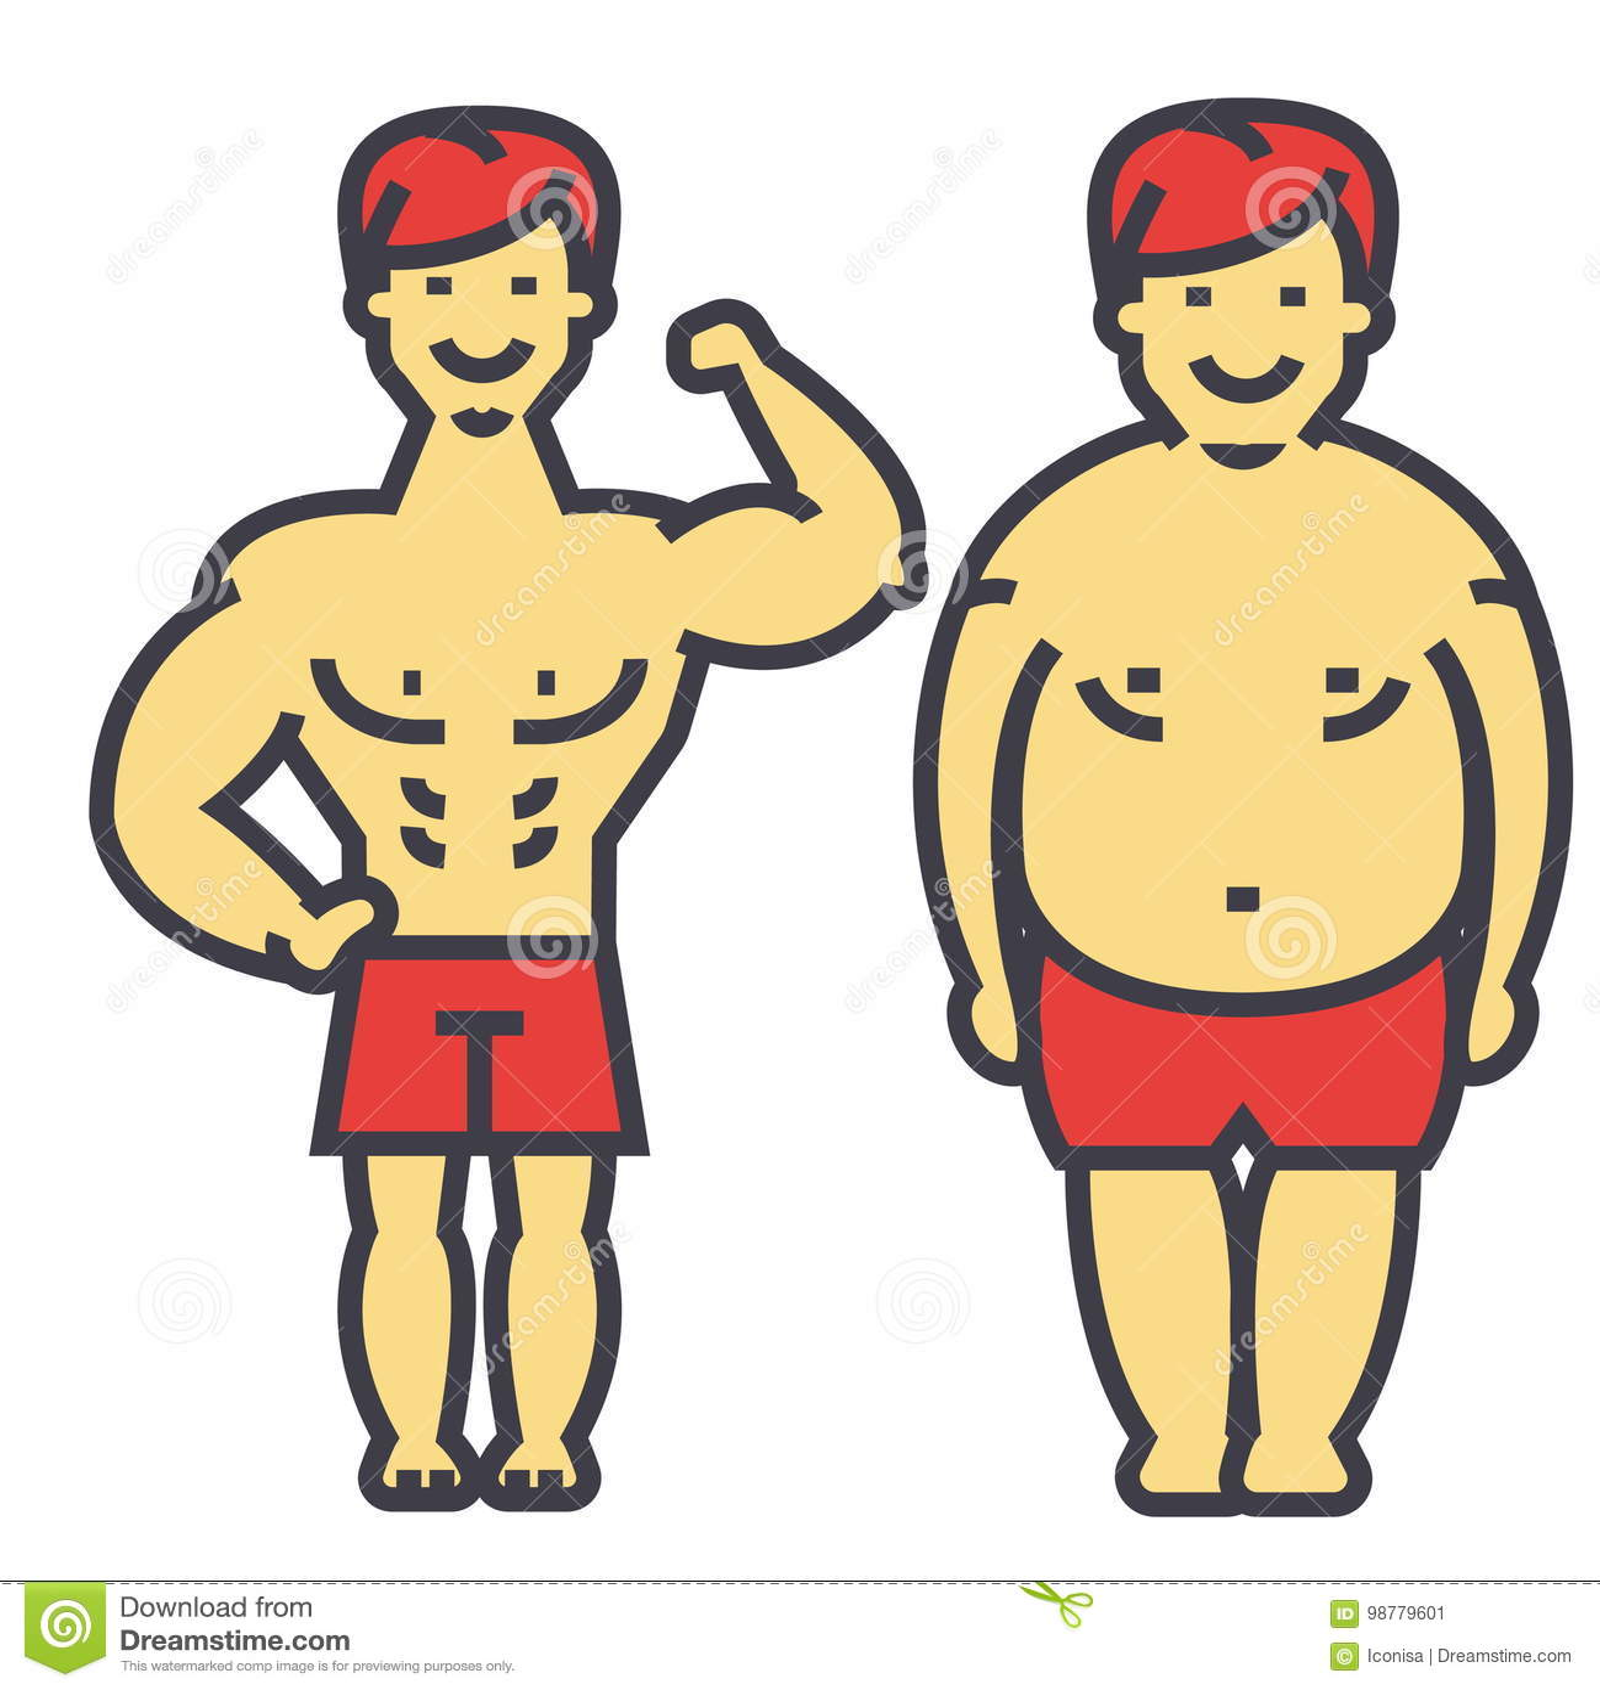 slimming boy)